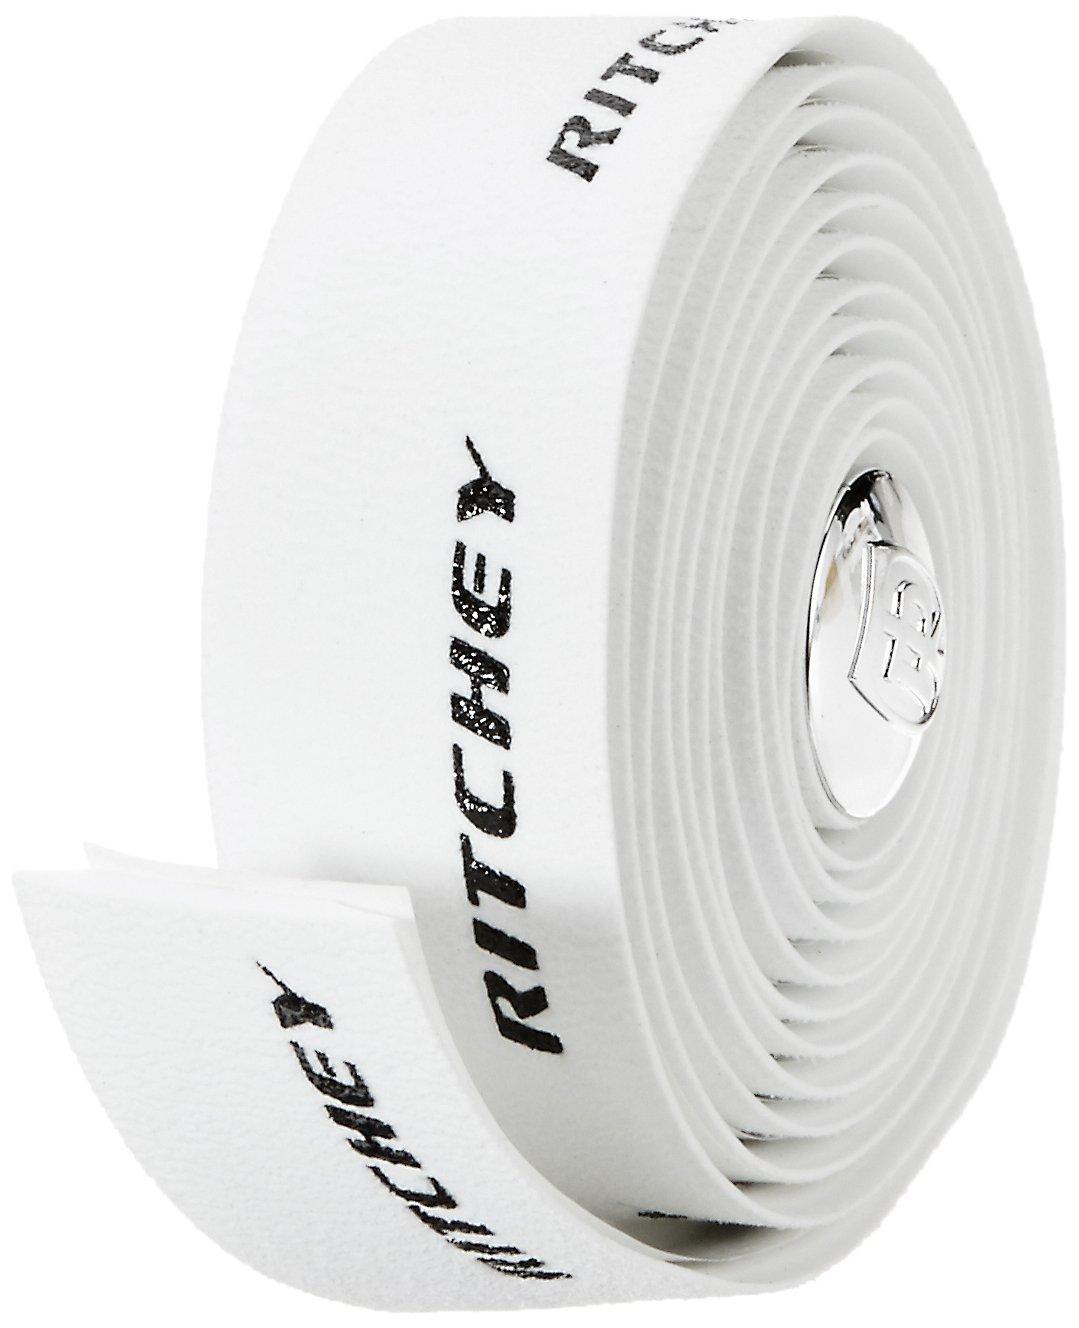 White Ritchey WCS Race Tape Road Bike Handlebar Tape